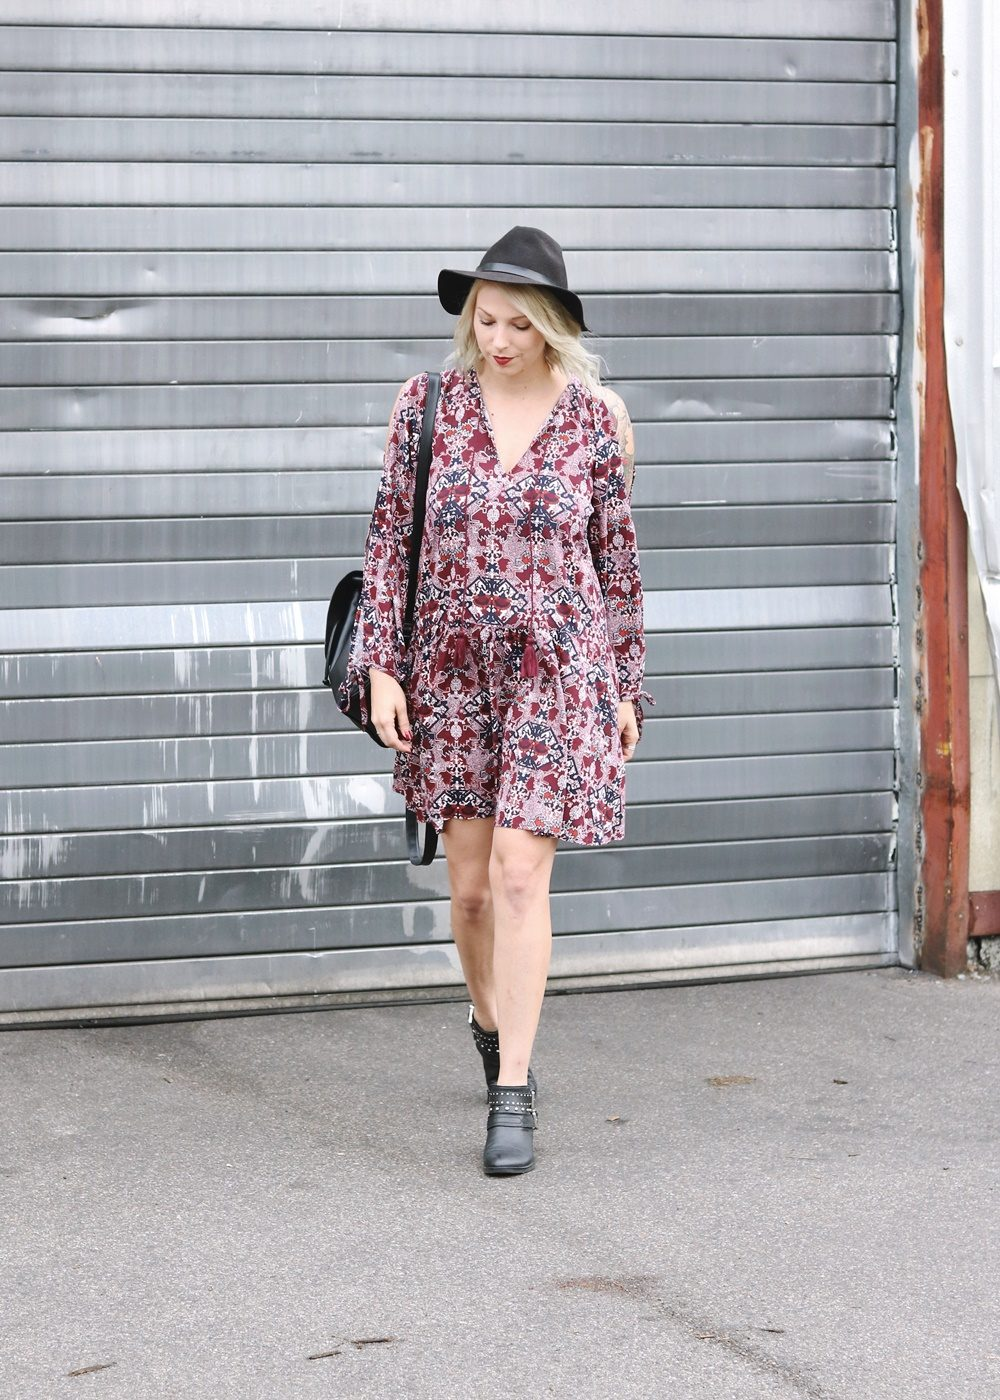 Fashionblogger Outfit Boho Kleid weinrot Bikerboots Rucksack Hut Ethno (28)